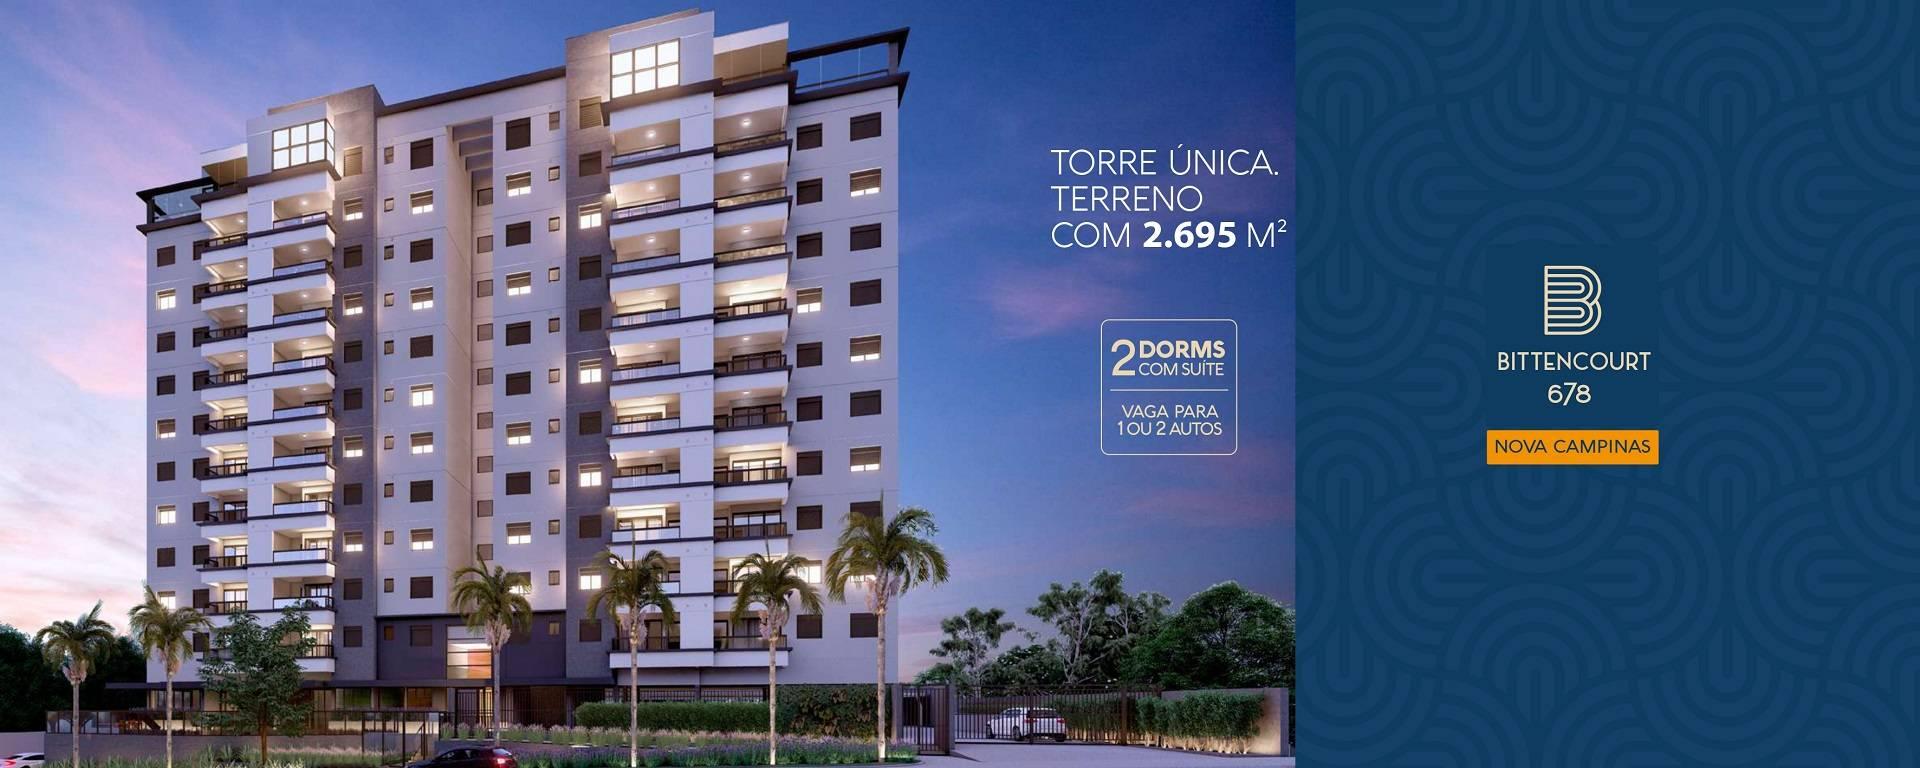 TALIPÔ EXCLUSIVE CLUB, Apartamento Pronto para Morar